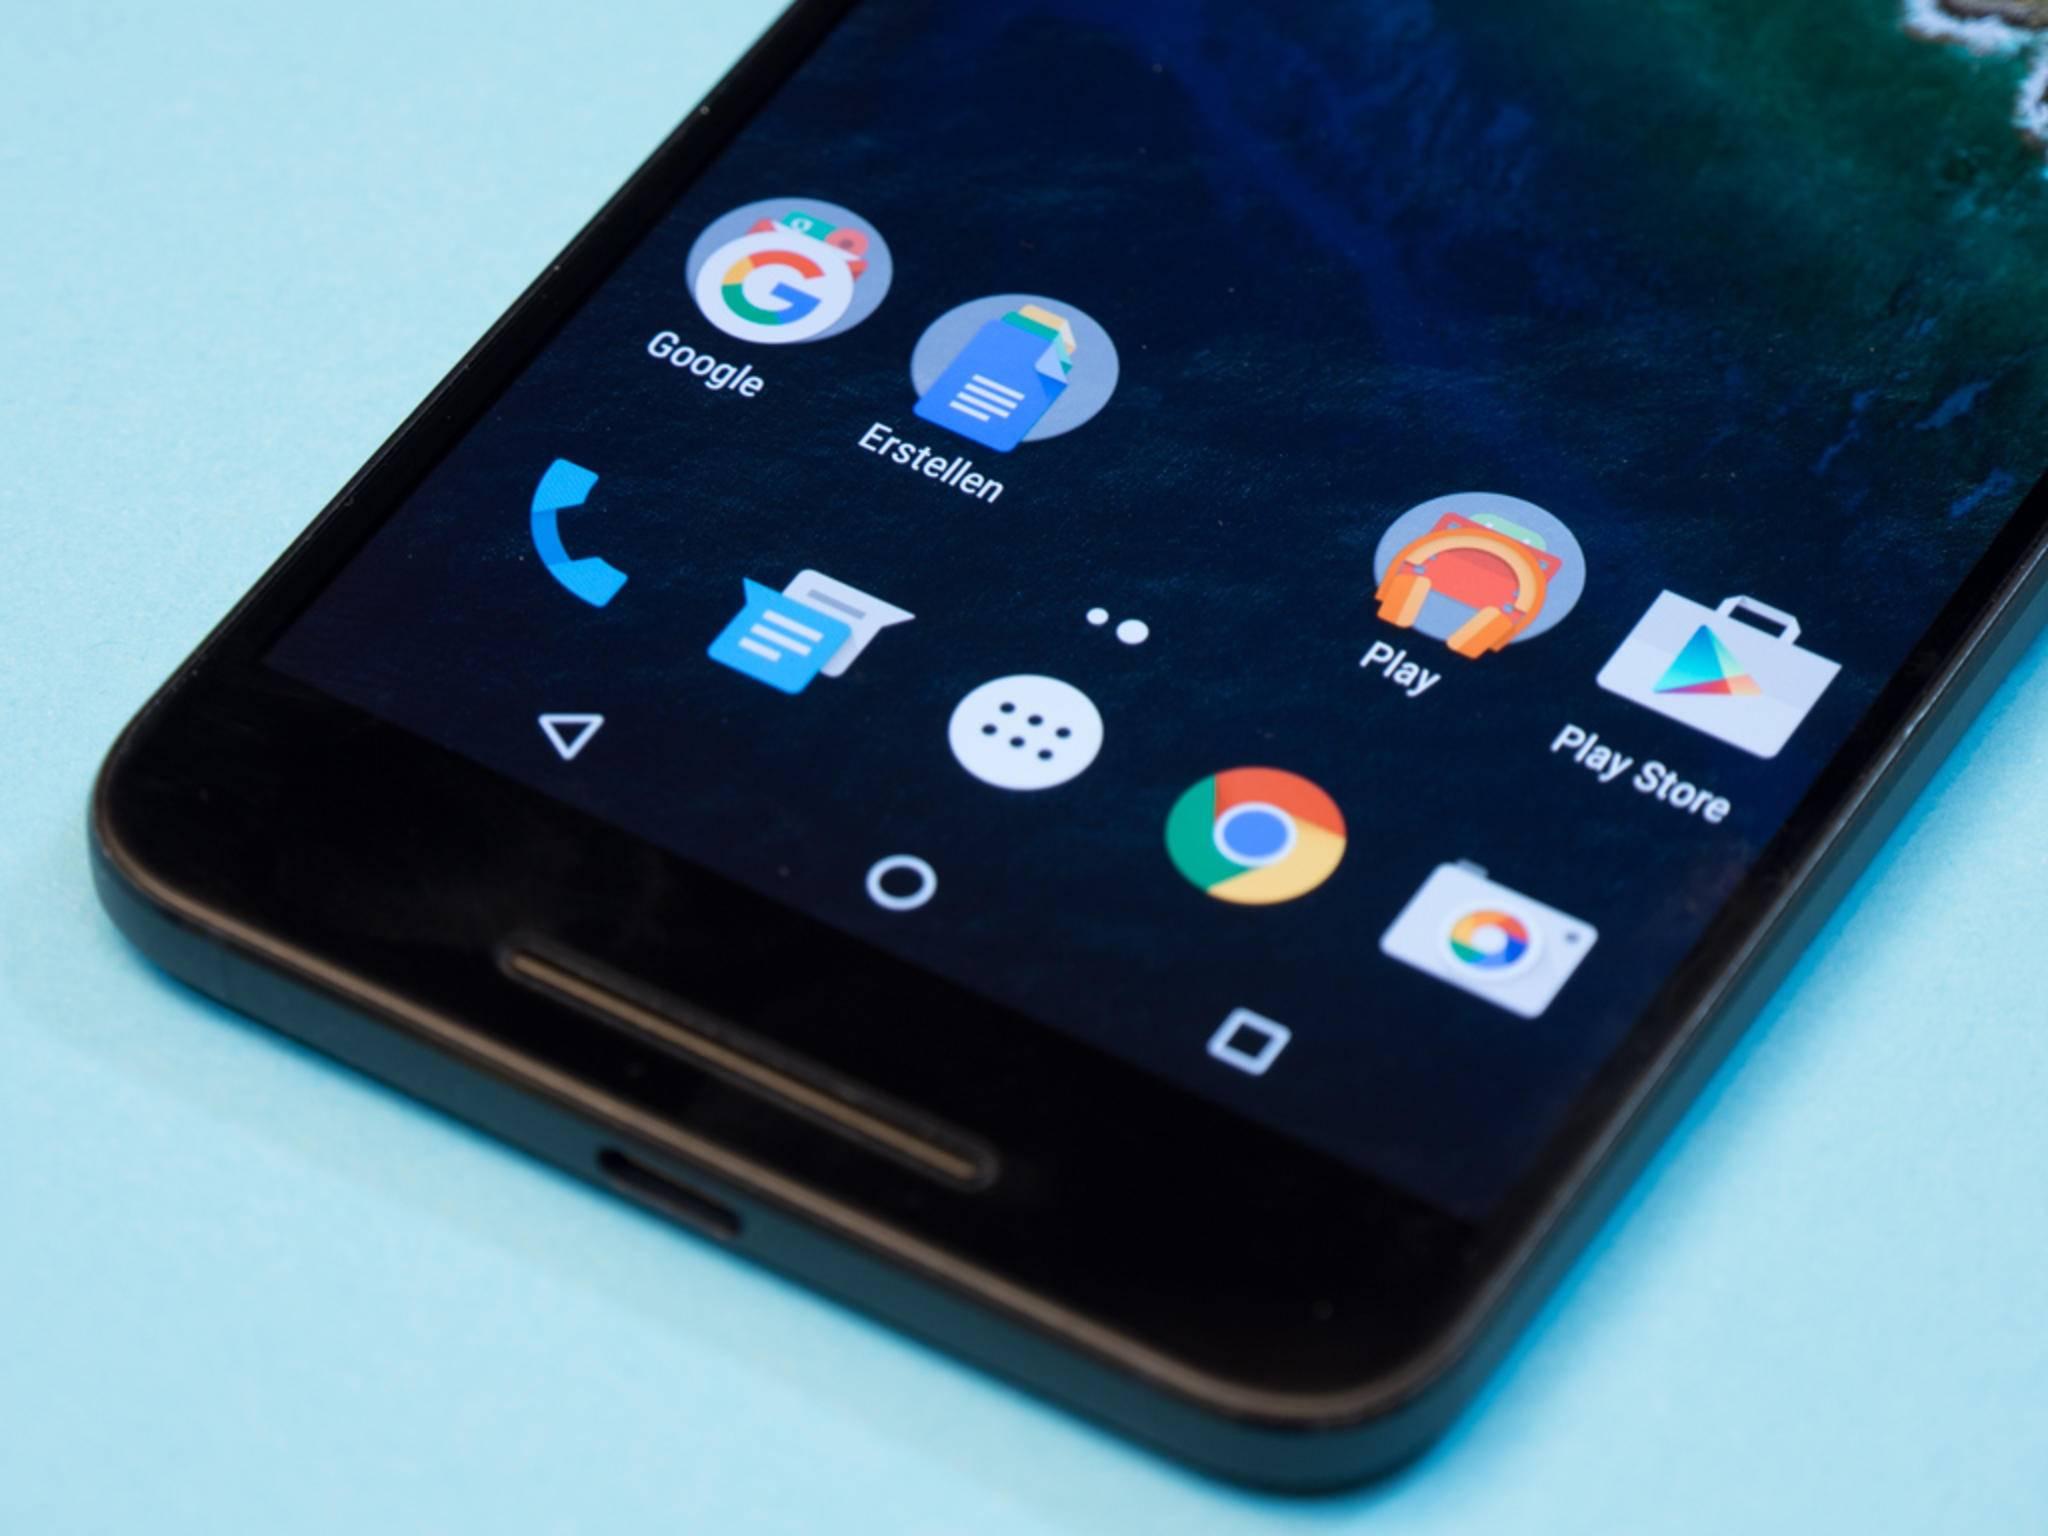 Hat Google bald mehr zu bieten als nur die Nexus-Smartphones?